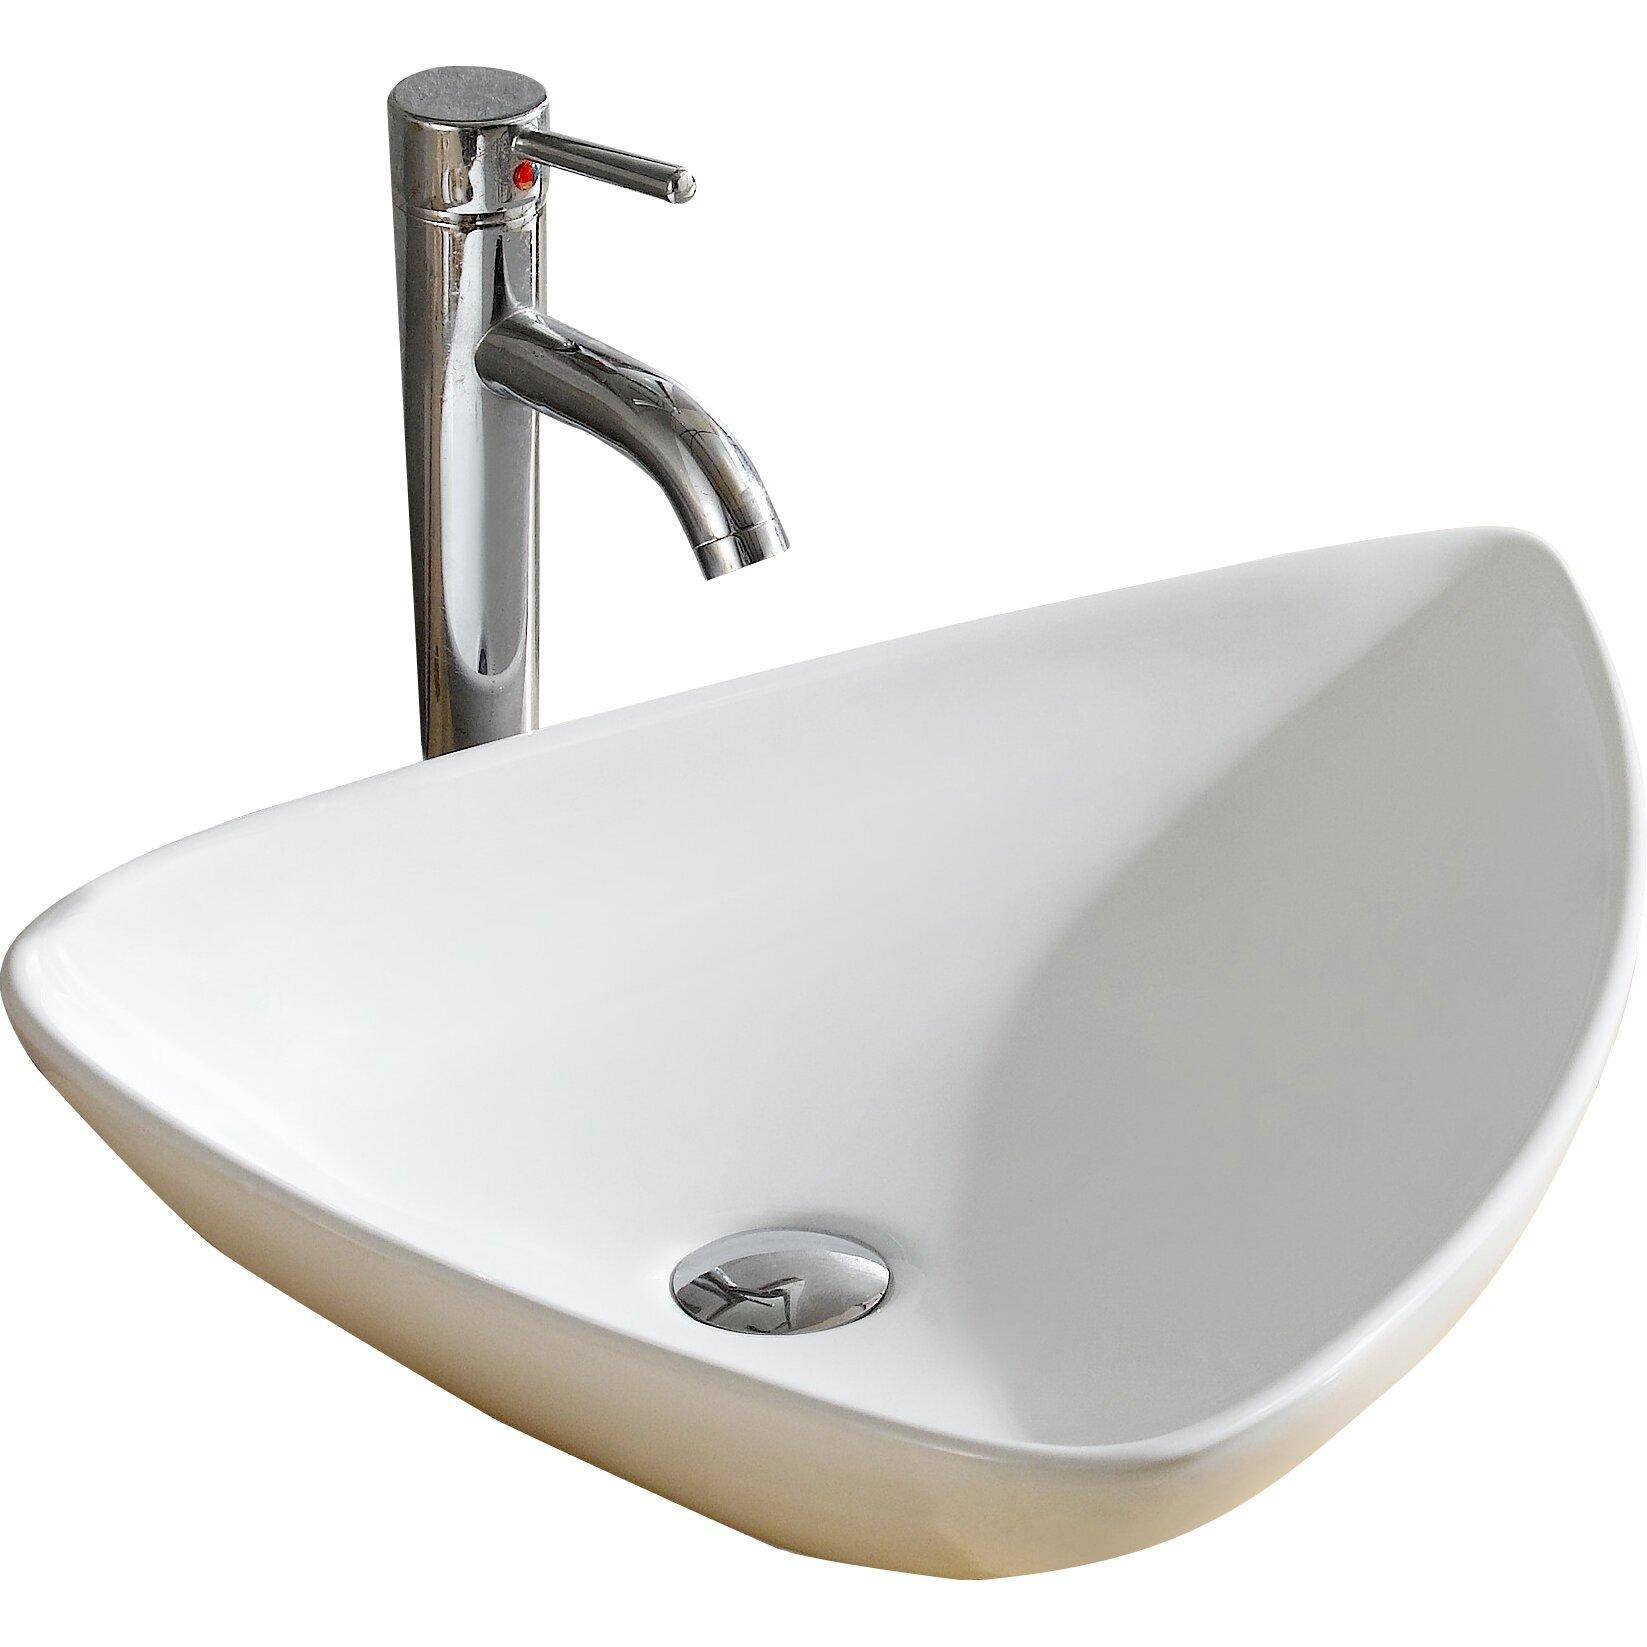 Fine Fixtures Modern Vitreous Triangular Vessel Sink